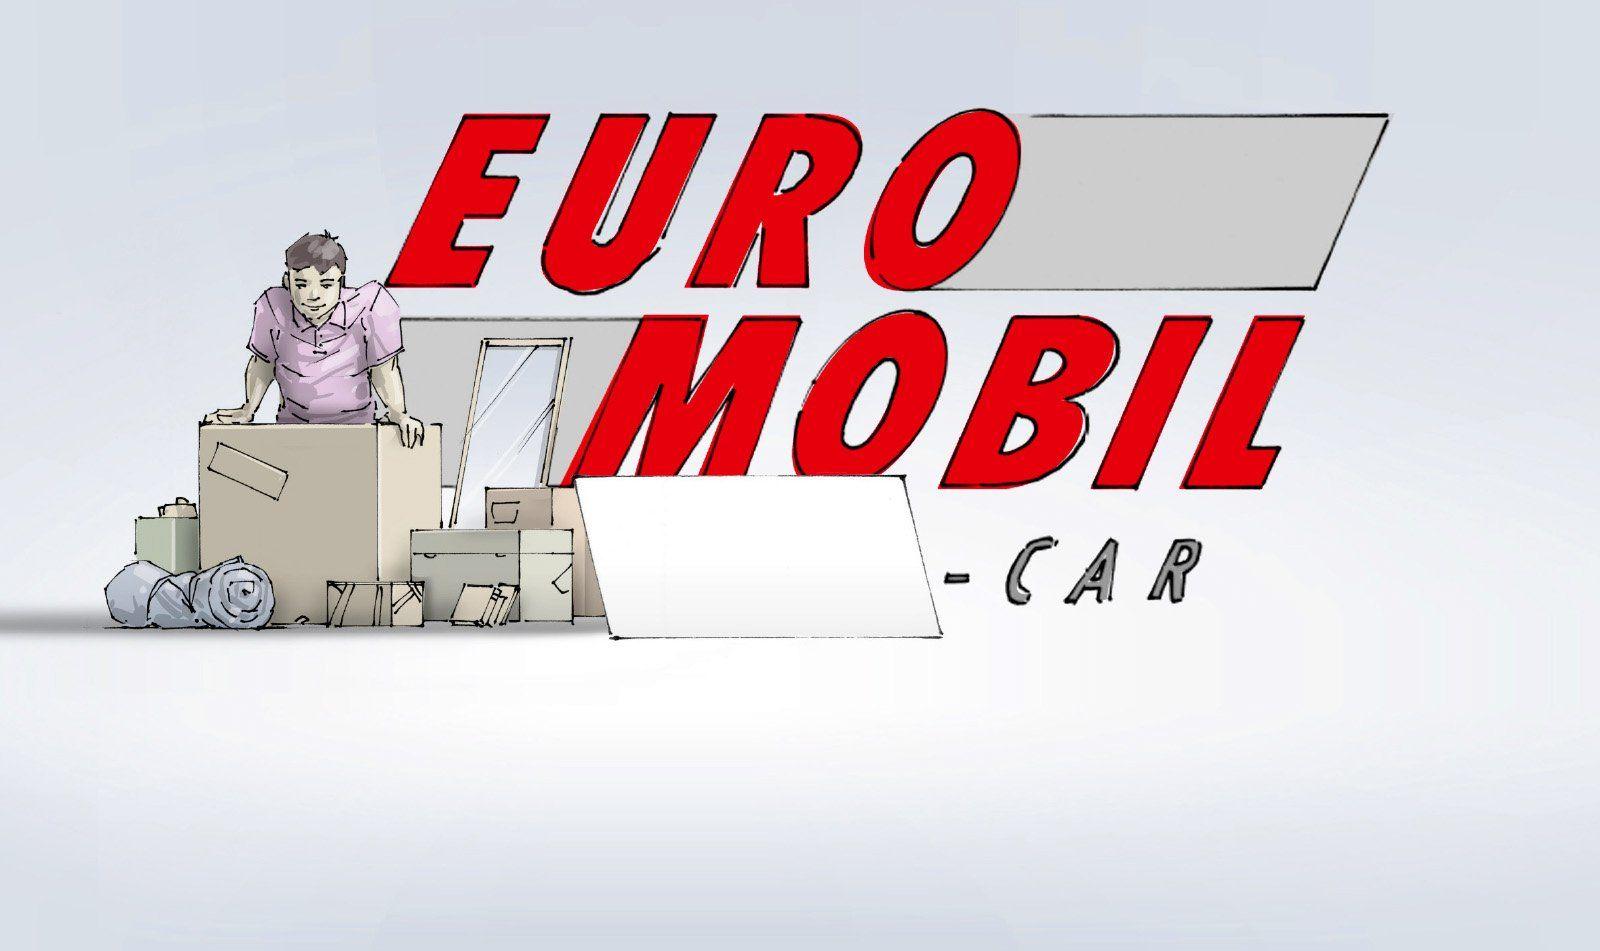 Euromobil Autovermietung Großflächenplakat Illustration